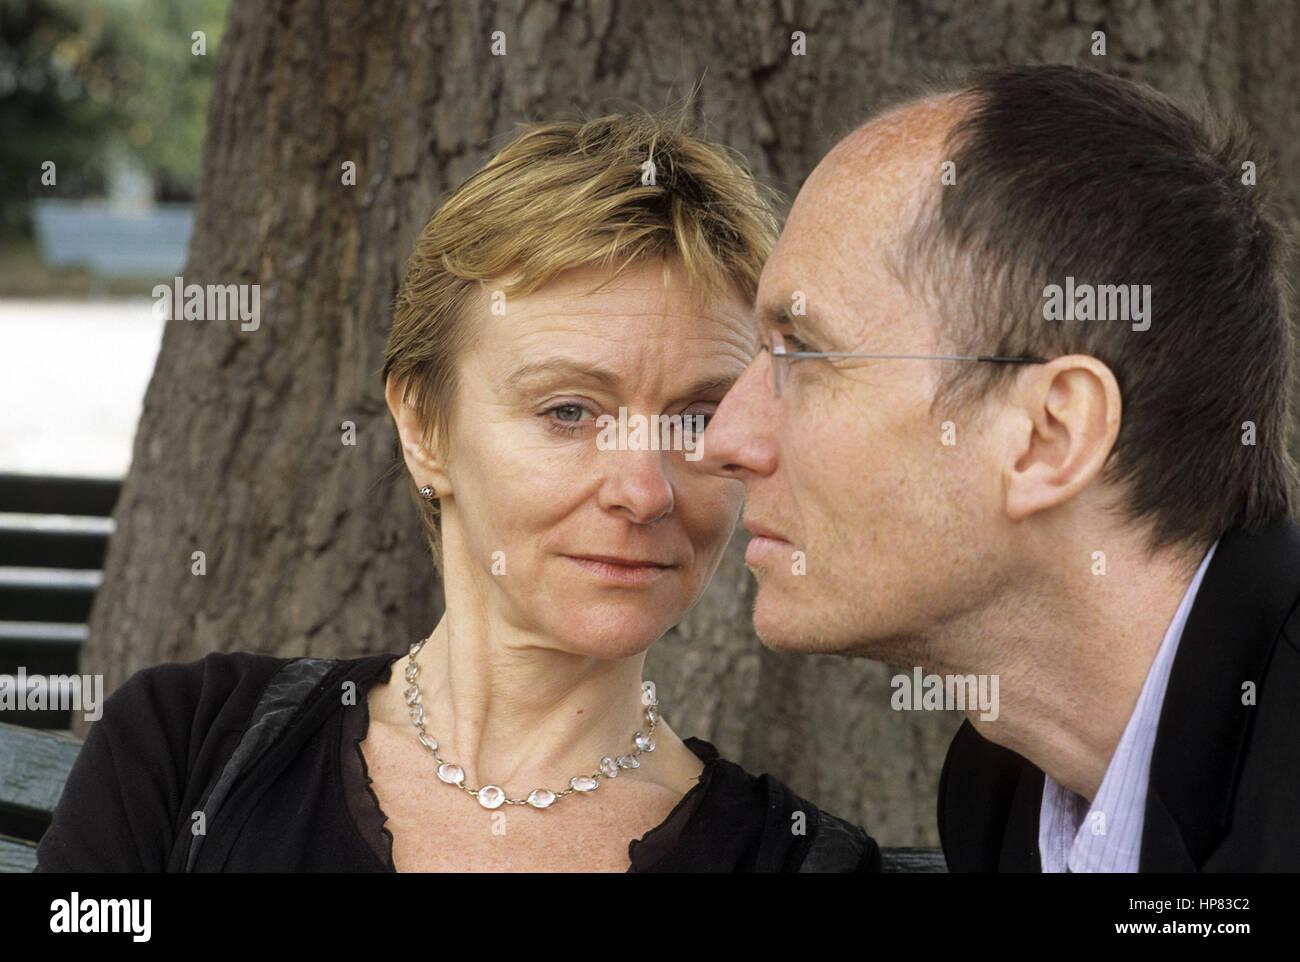 dating rojalti